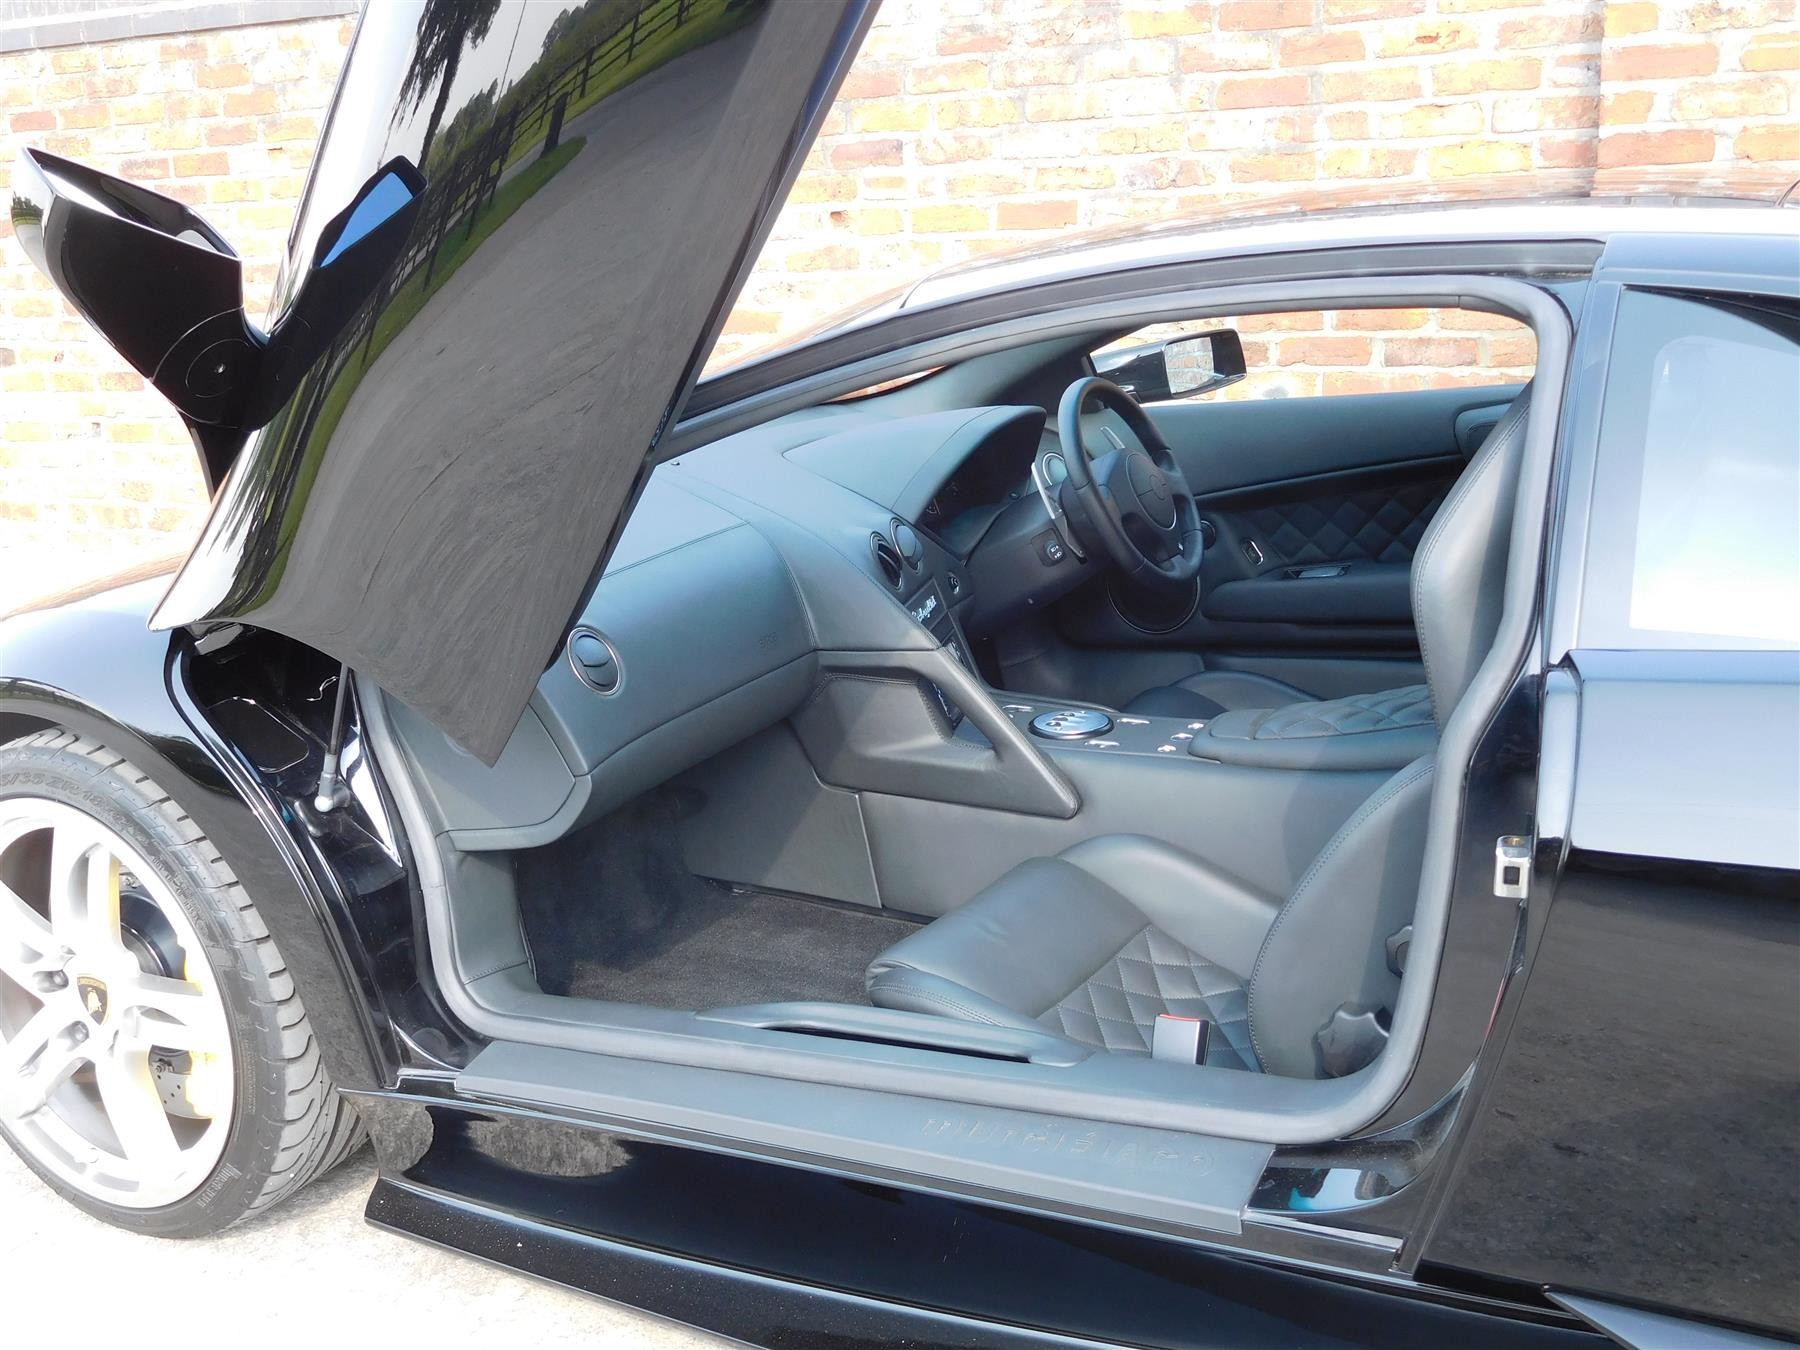 2007_Lamborghini_Murcielago_sale-0012